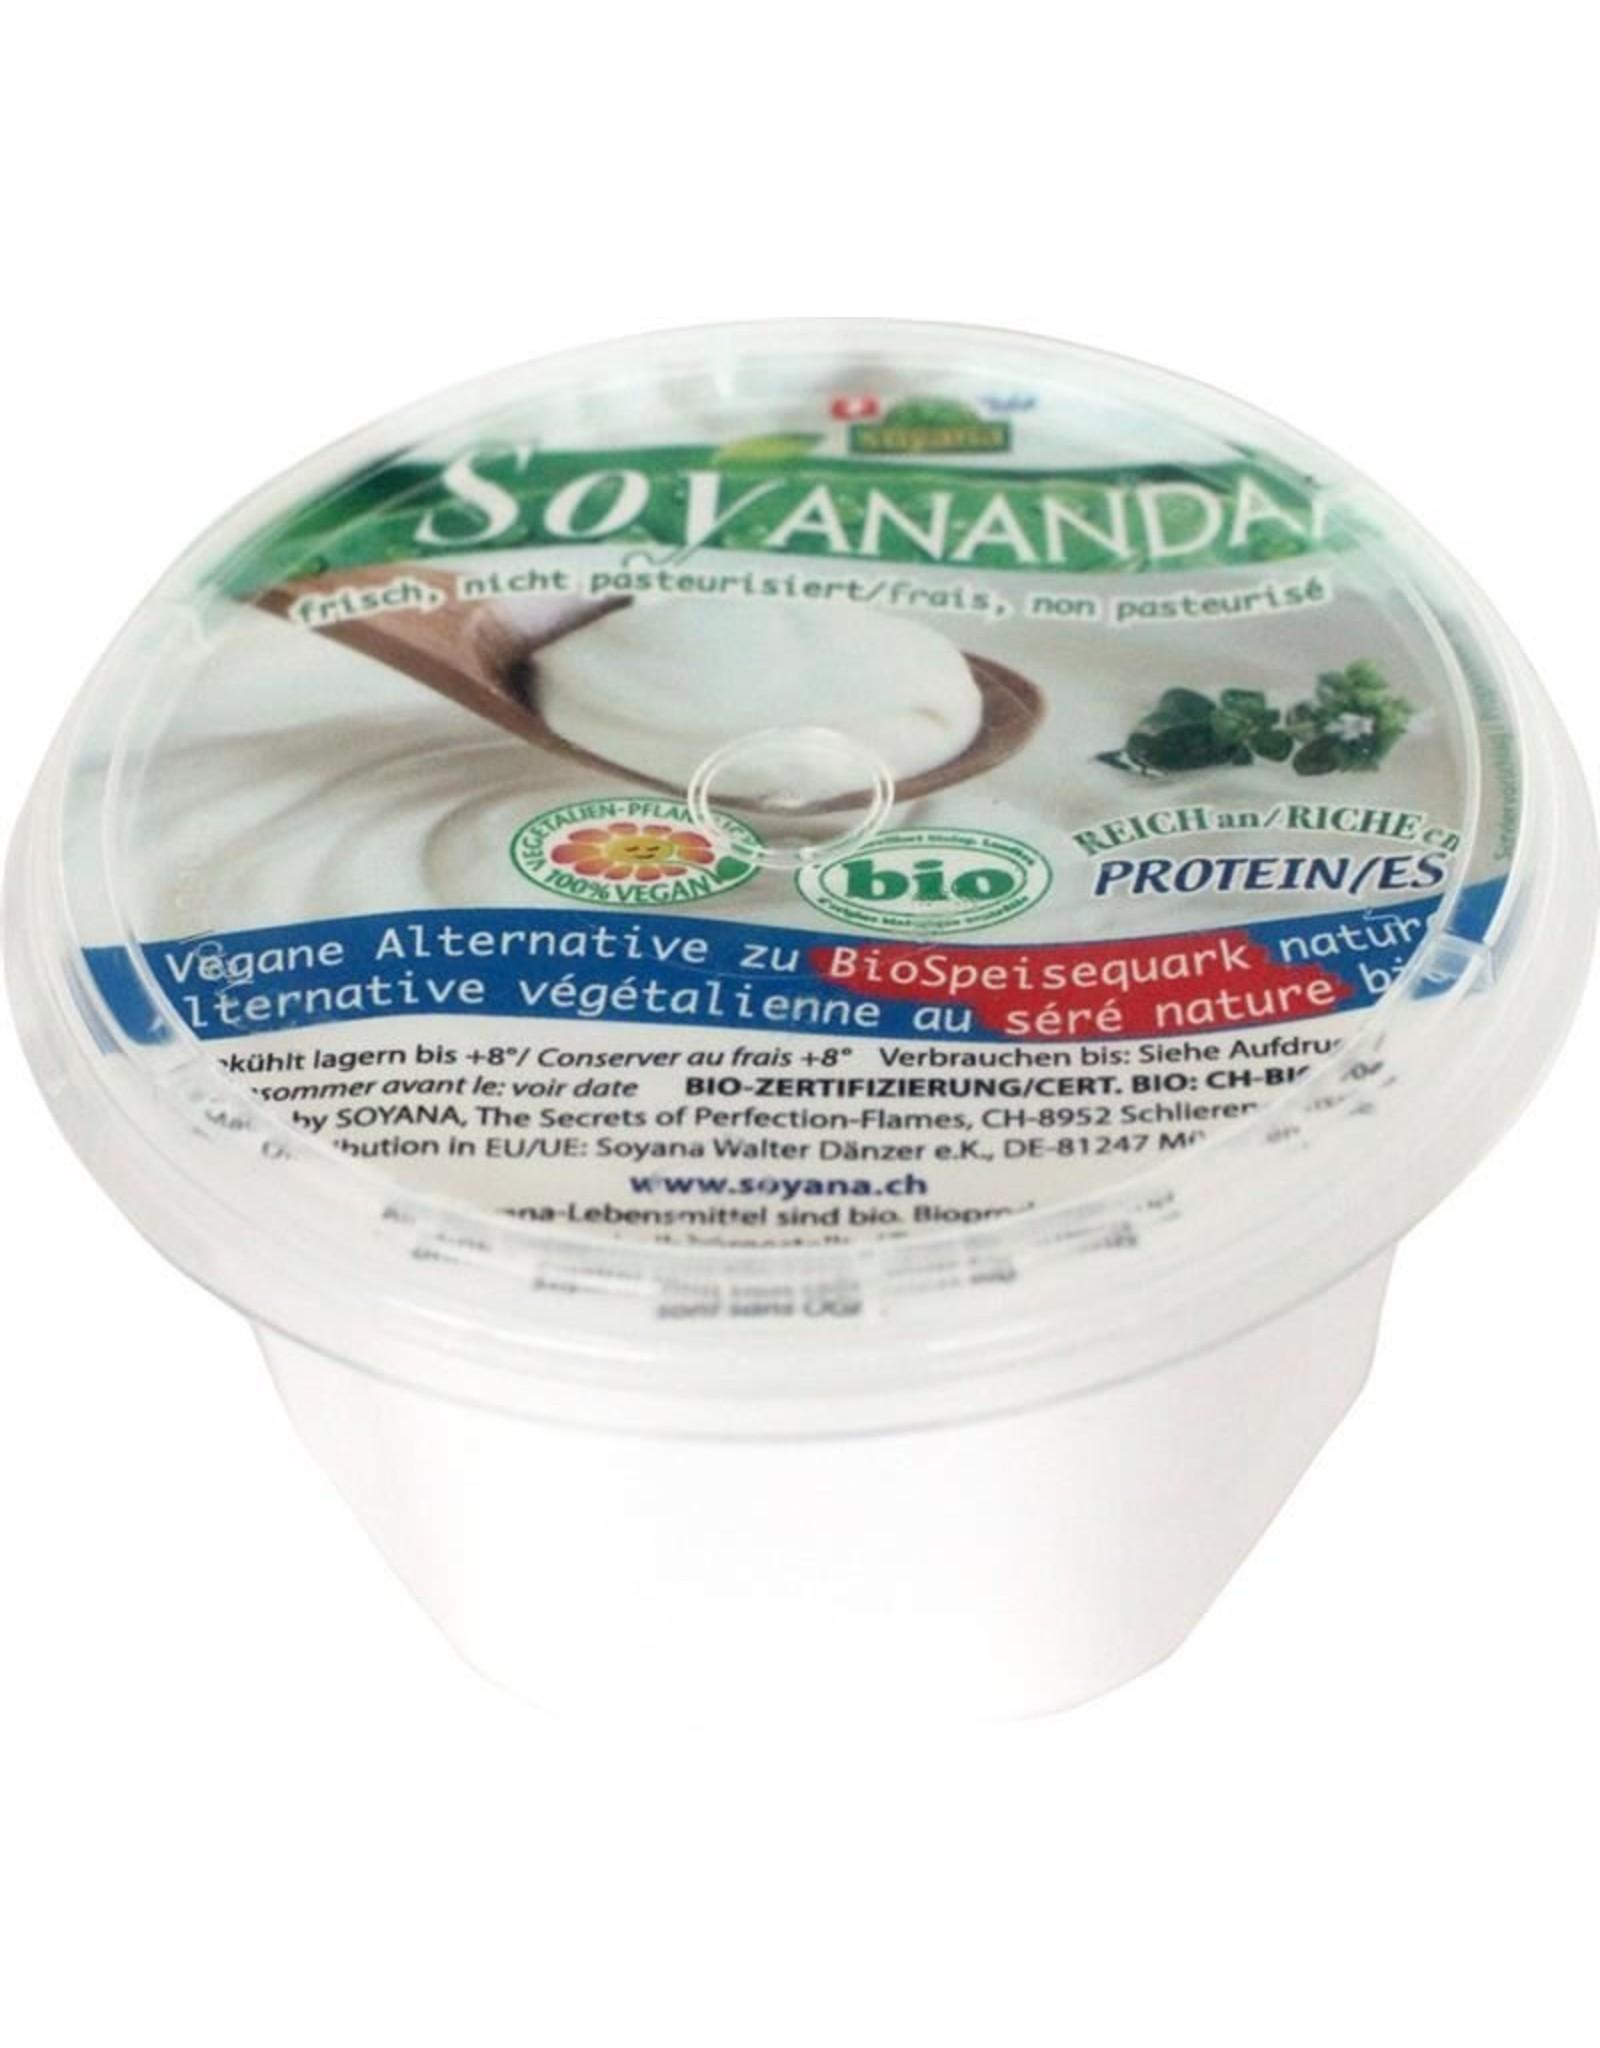 Soyana Alternative zu Speisequark Natur 200g